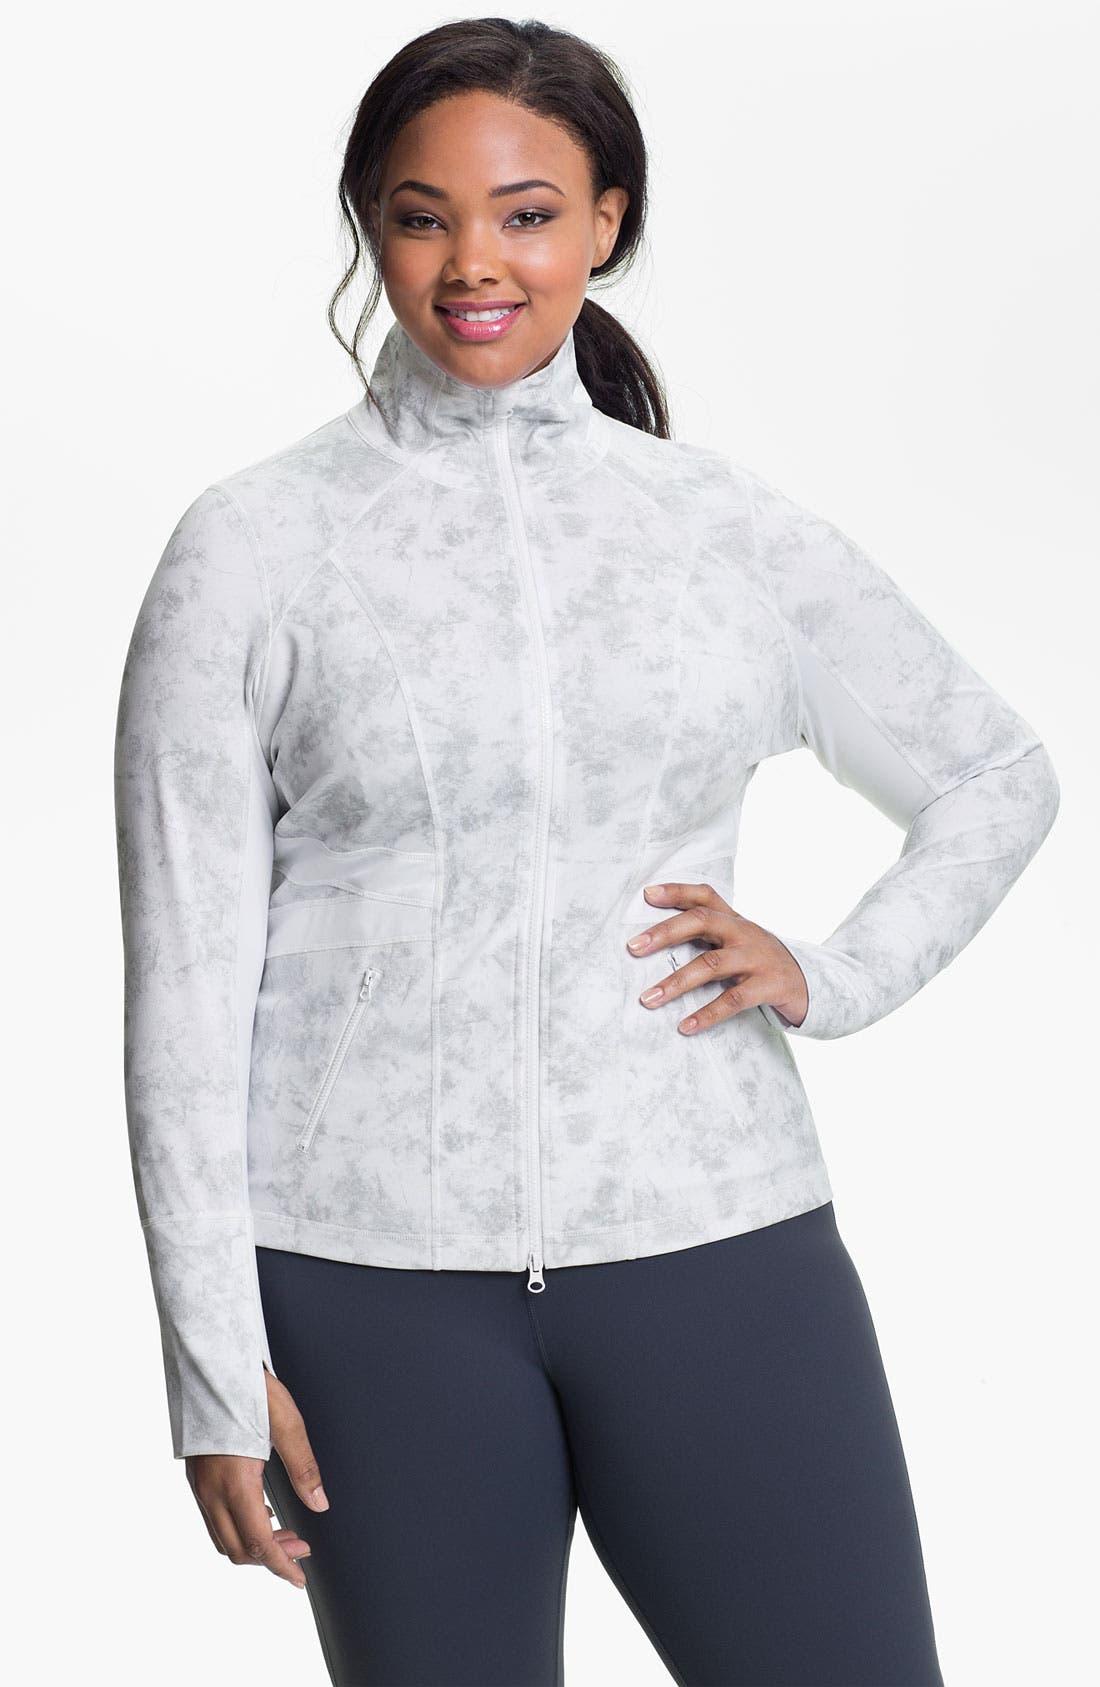 Alternate Image 1 Selected - Zella 'Karin' Fitted Jacket (Plus)